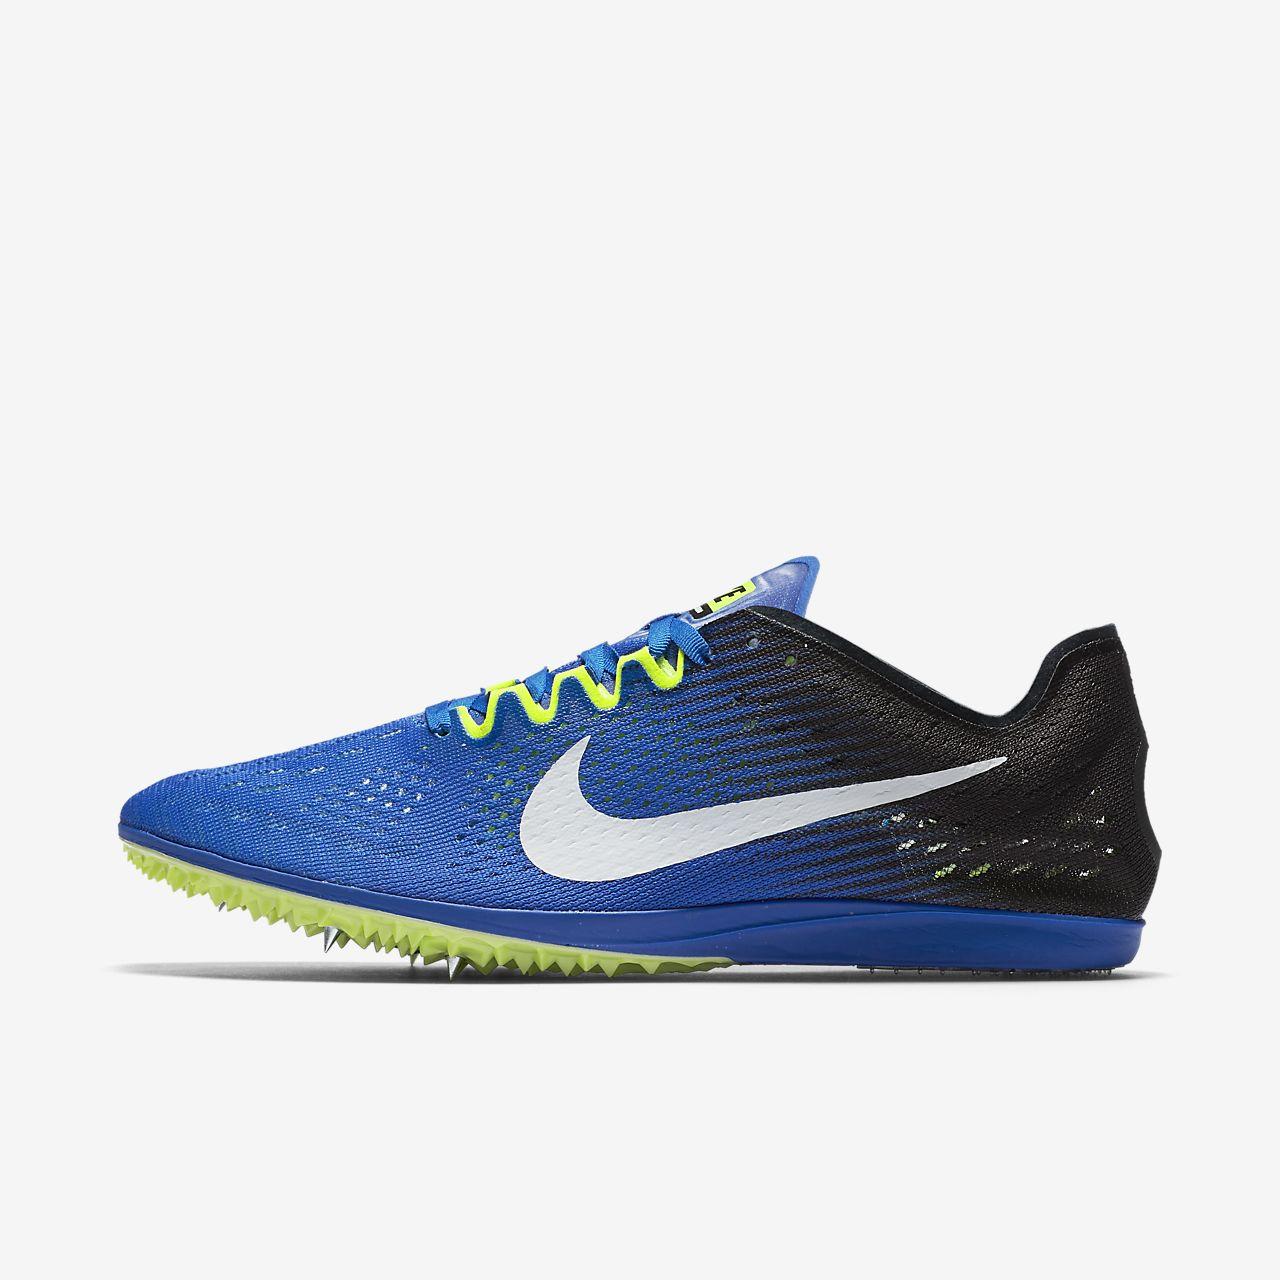 pretty nice 0494a 91080 ... Chaussure de course longue distance à pointes mixte Nike Zoom Matumbo 3